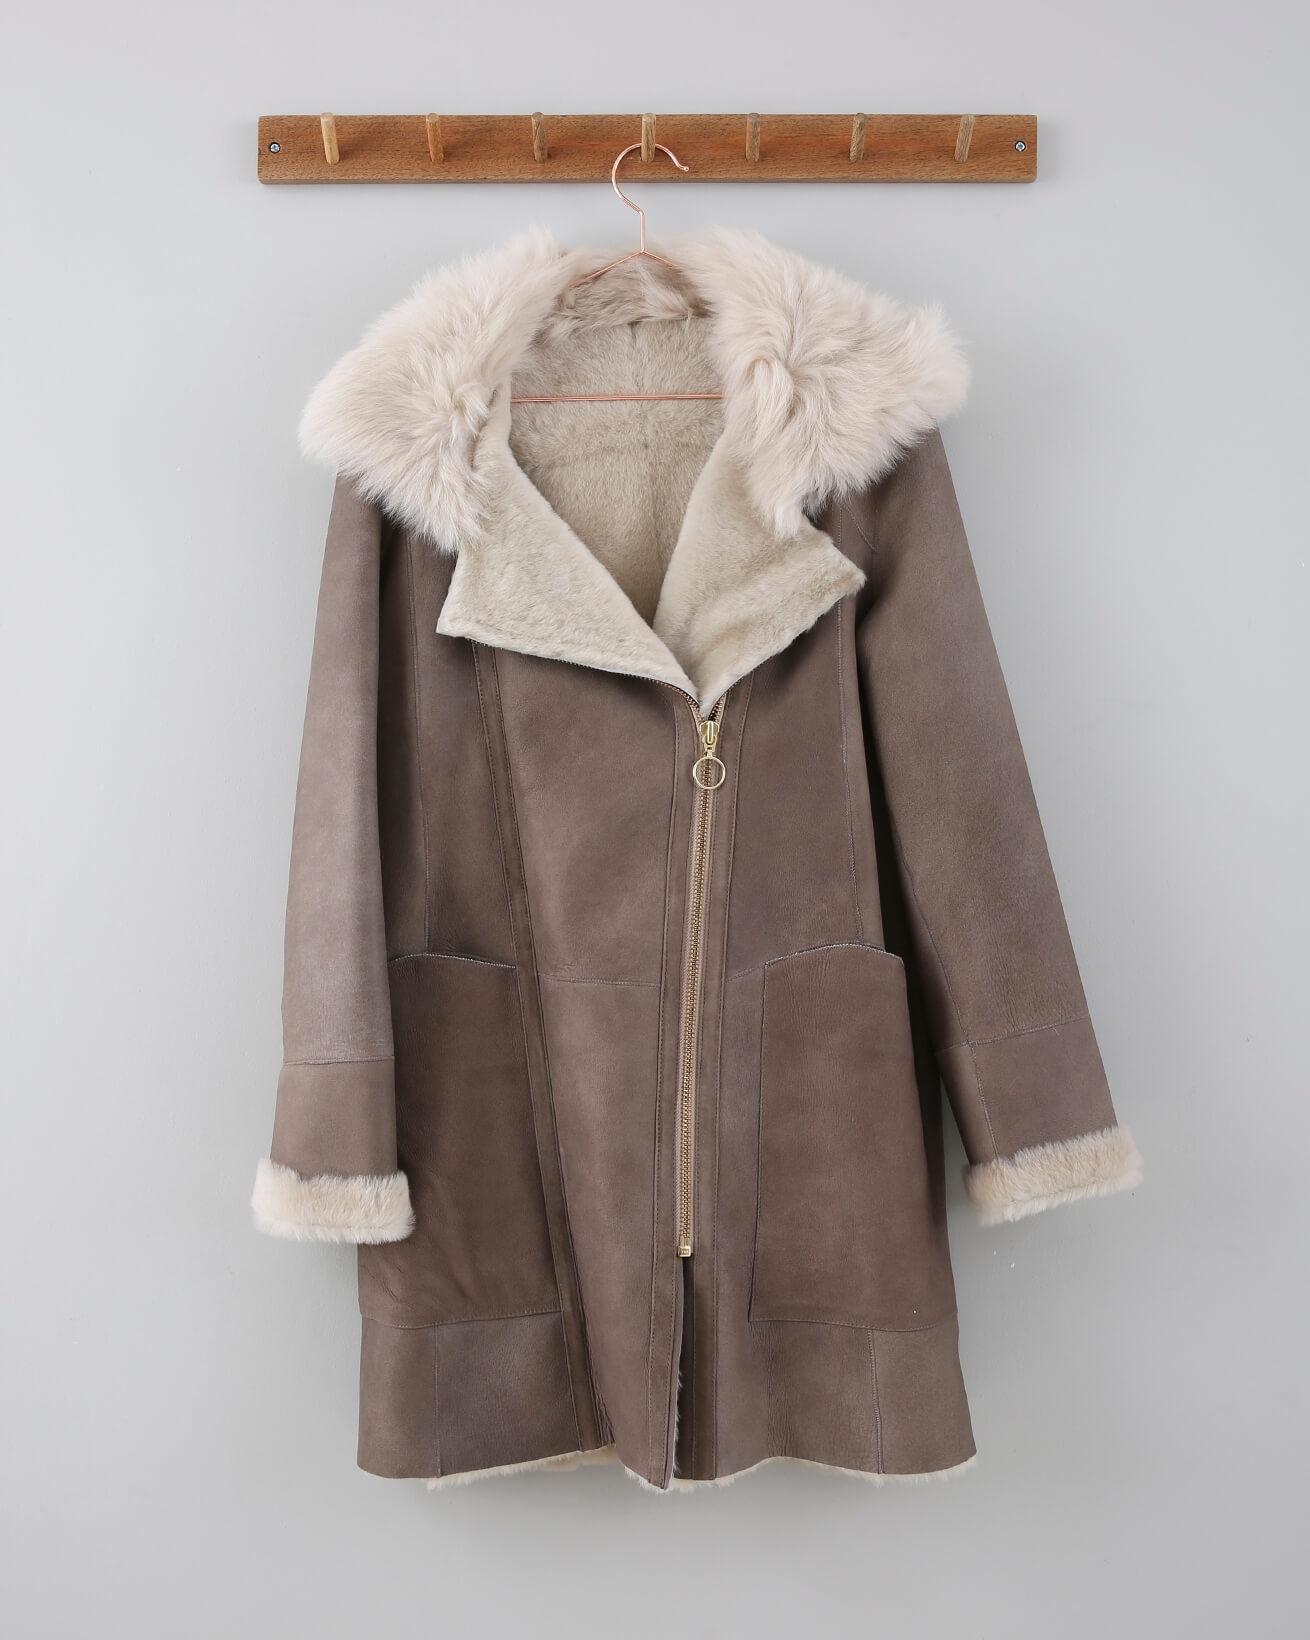 Reversible Double Zip Parka - Size 10 - Pale Grey / Ivory - 656